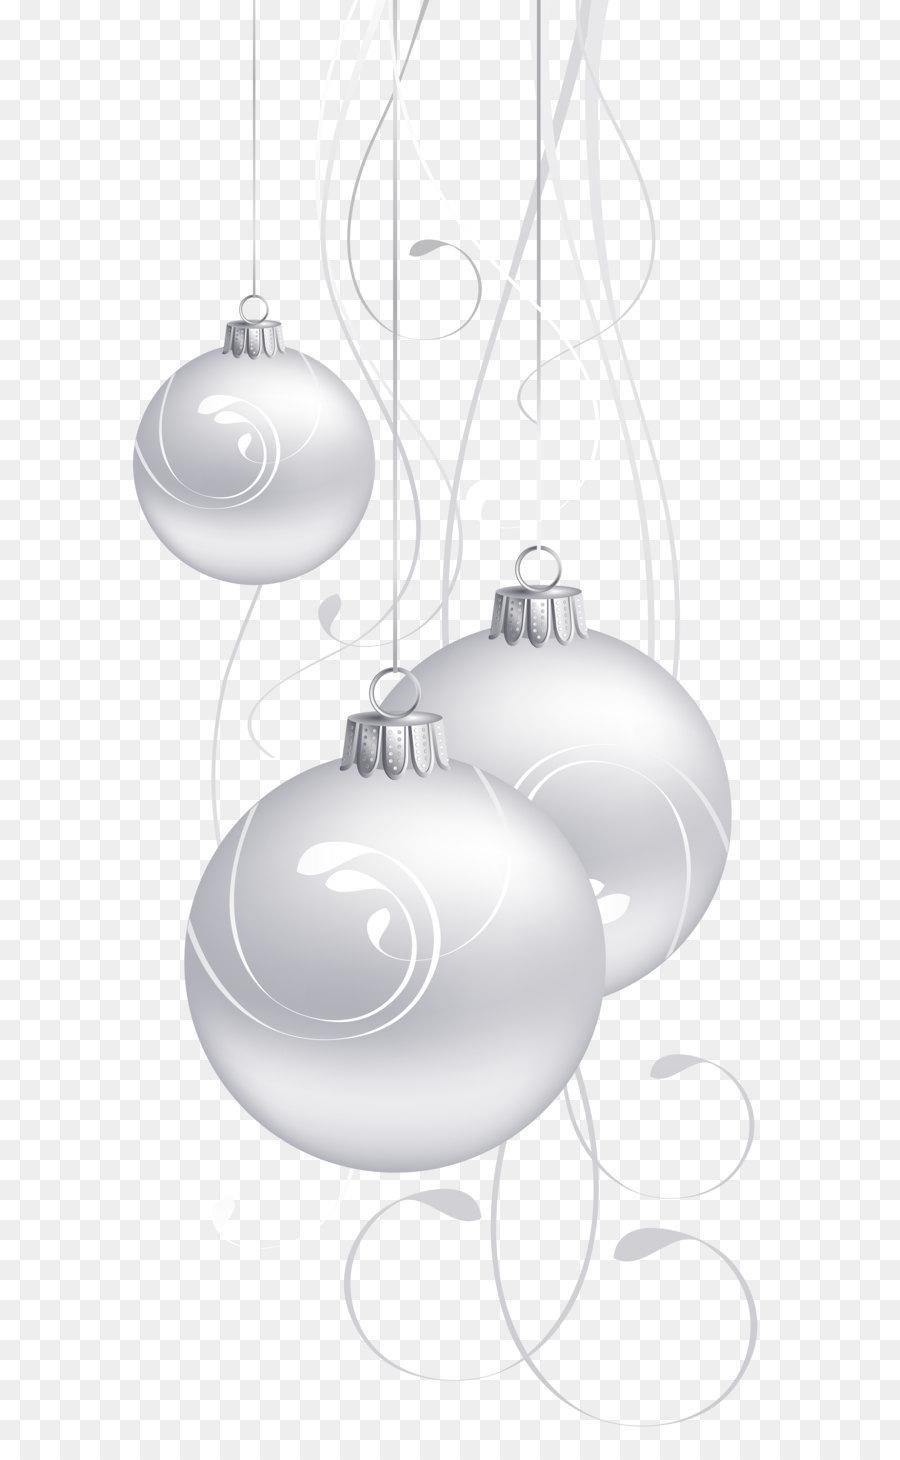 black and white purple white christmas balls png clip art - White Christmas Balls